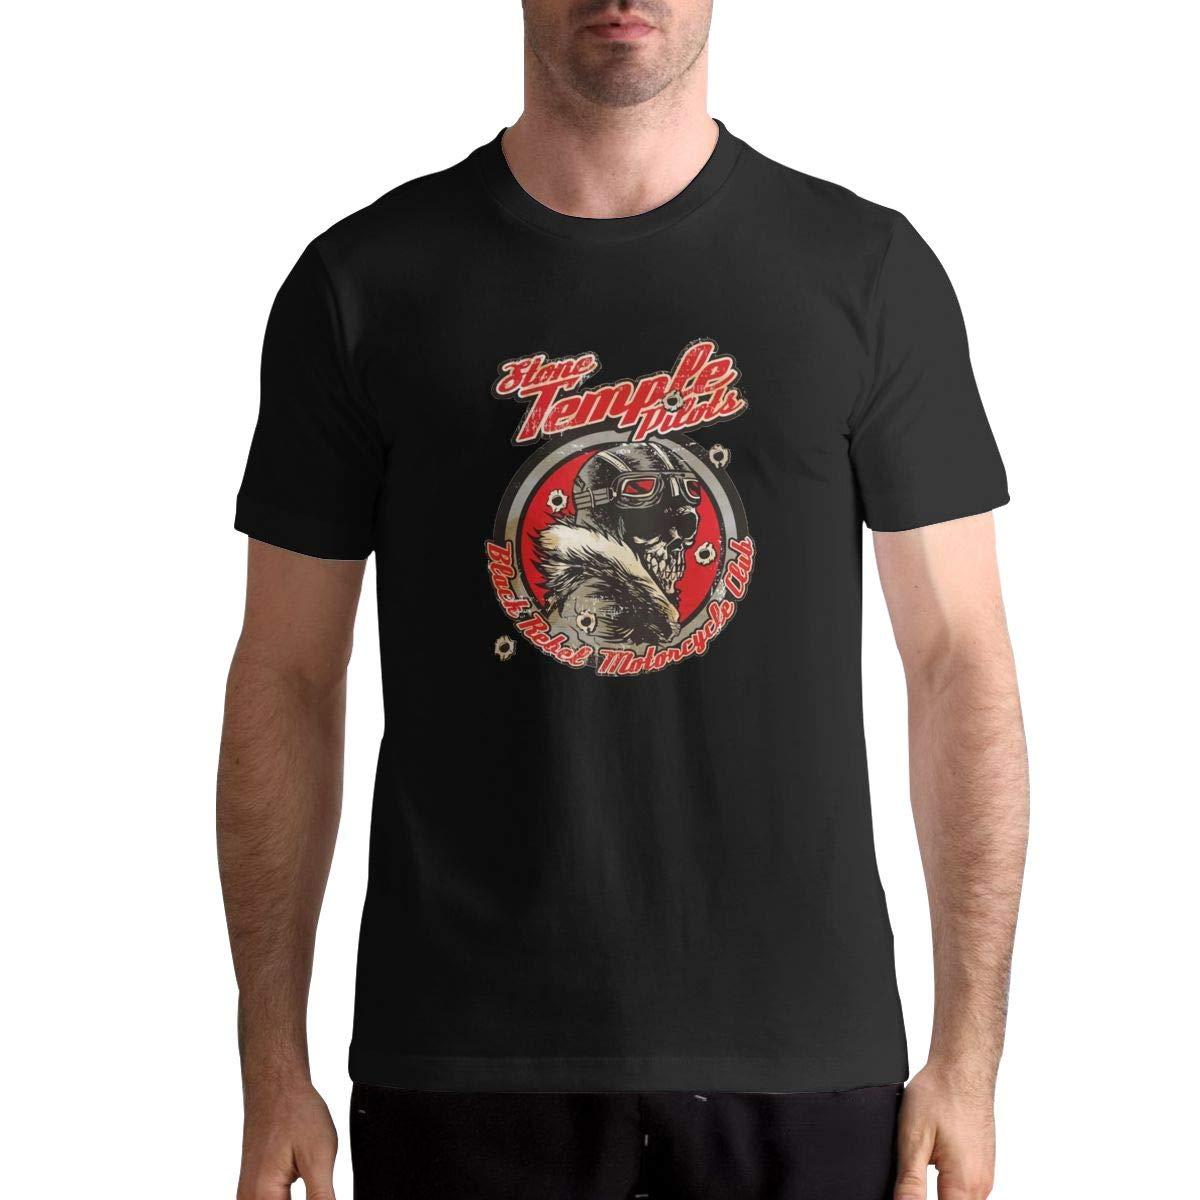 Stone Temple Pilots Soft Men Tops Short Sleeve T-Shirt